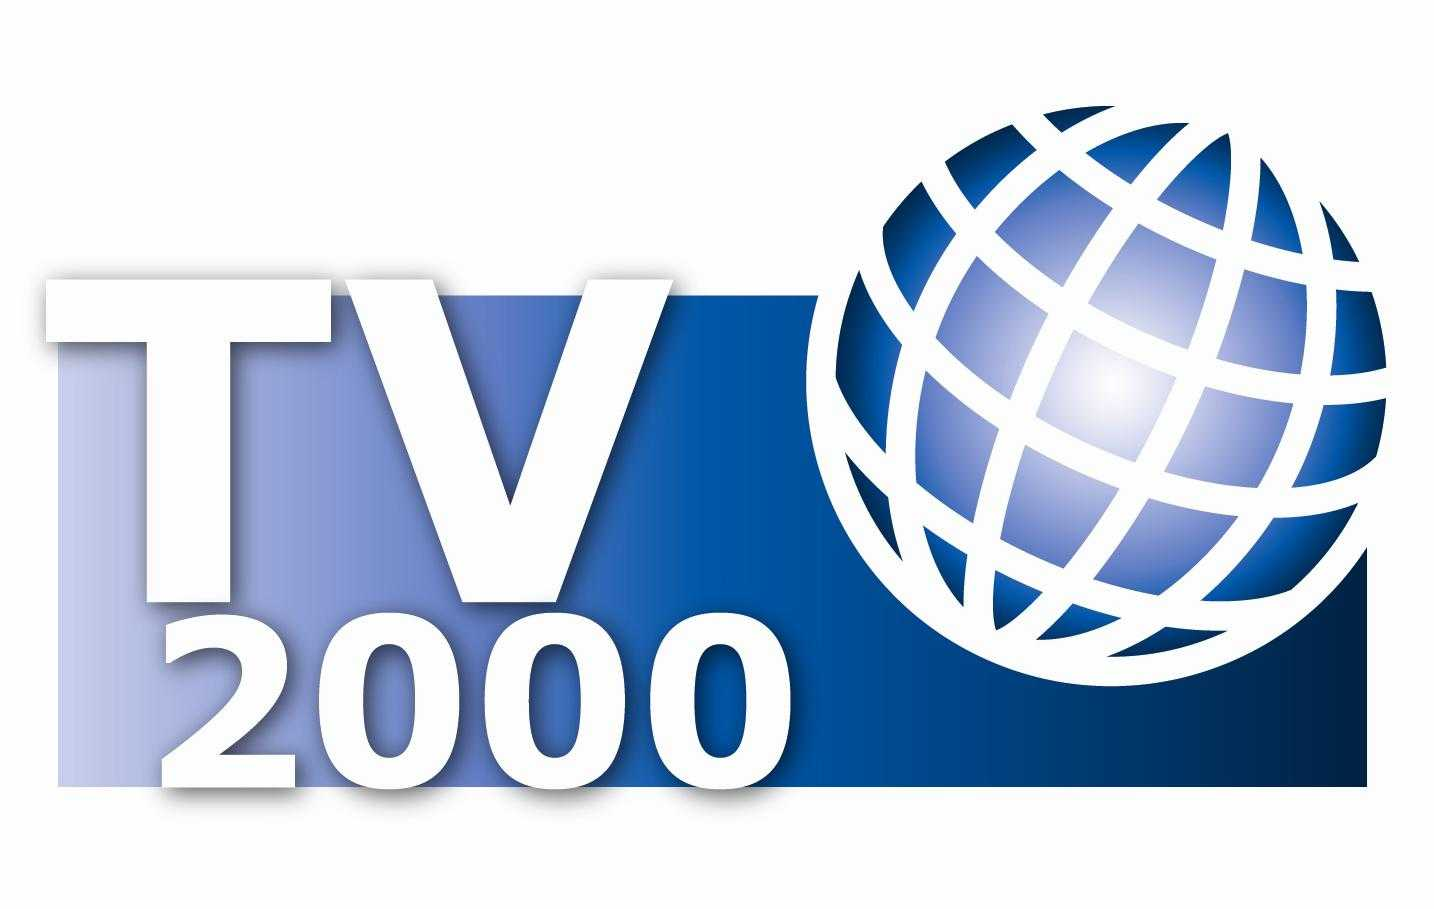 Tv2000: «Insieme nella Settimana Santa» | Digitale terrestre: Dtti.it